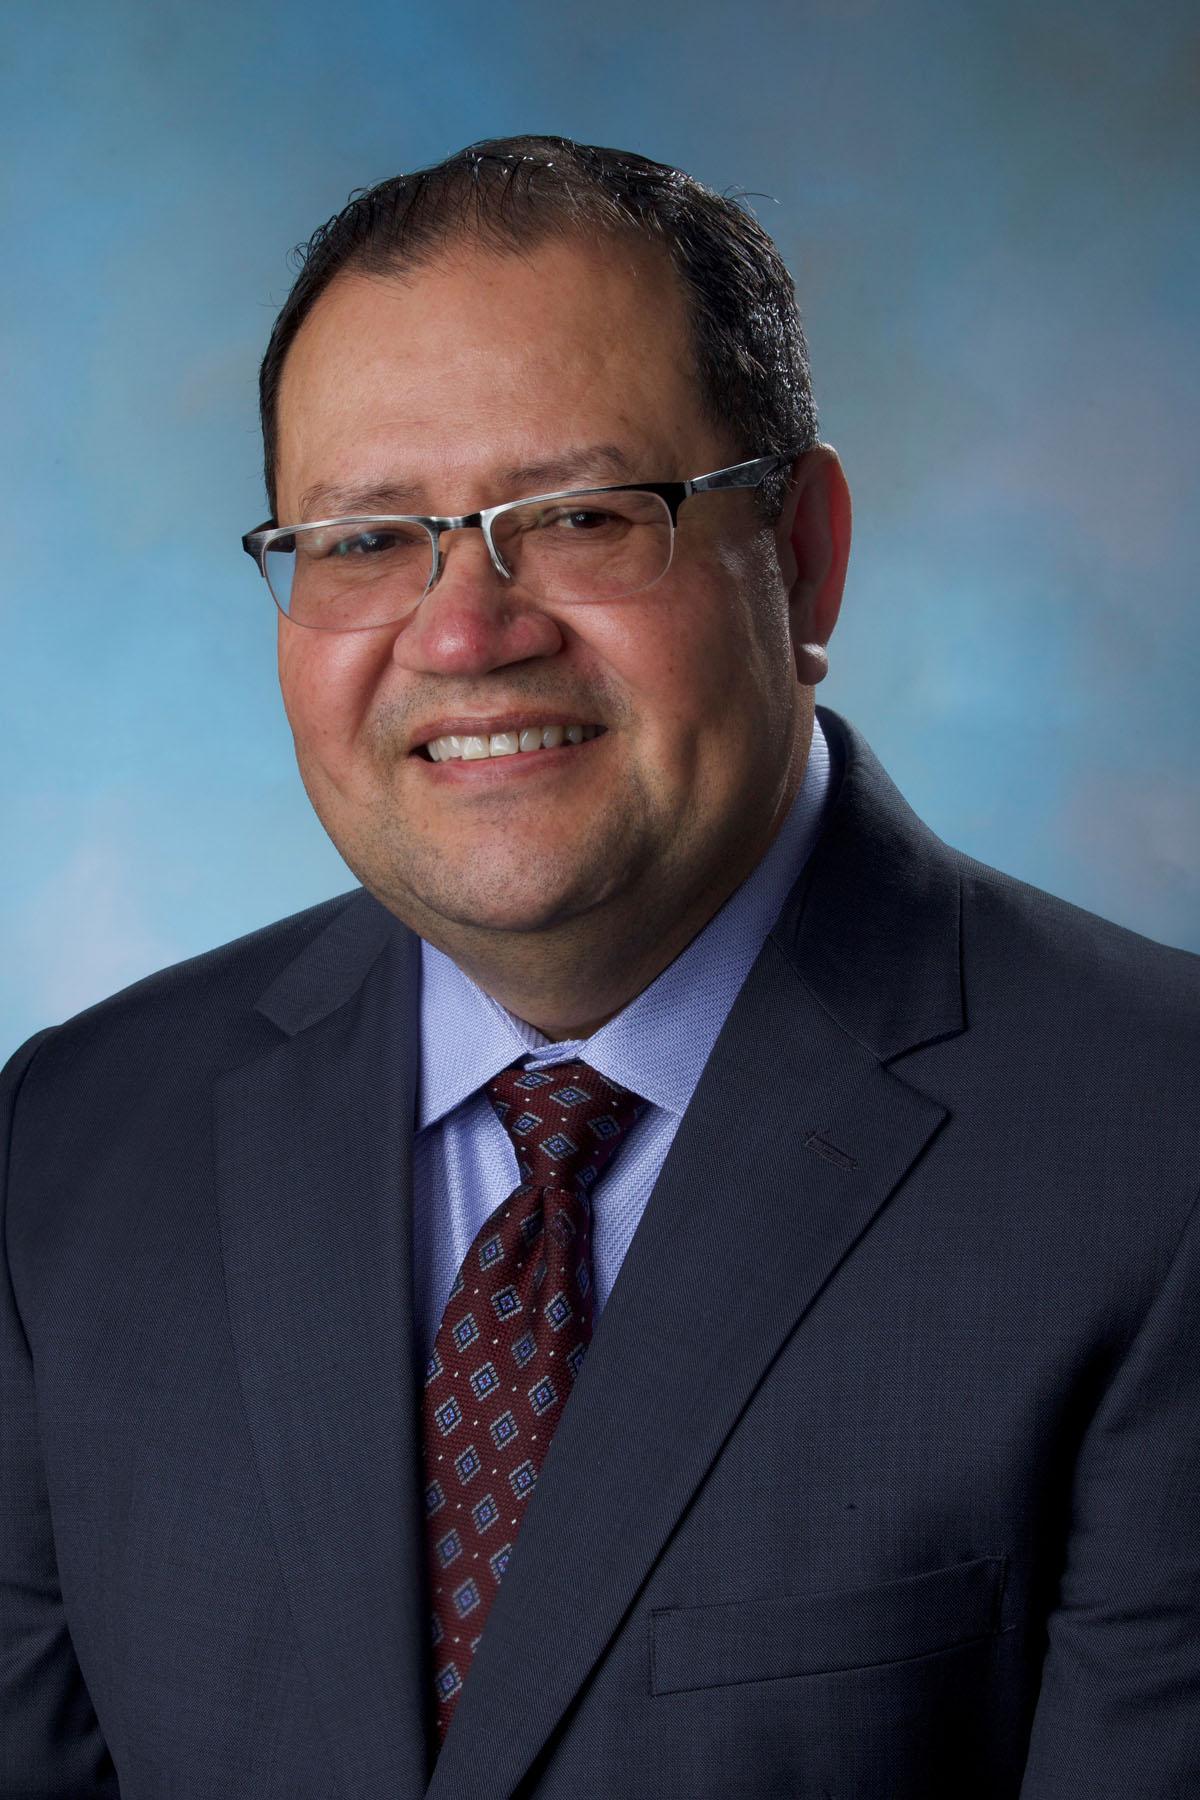 Marvin Martinez